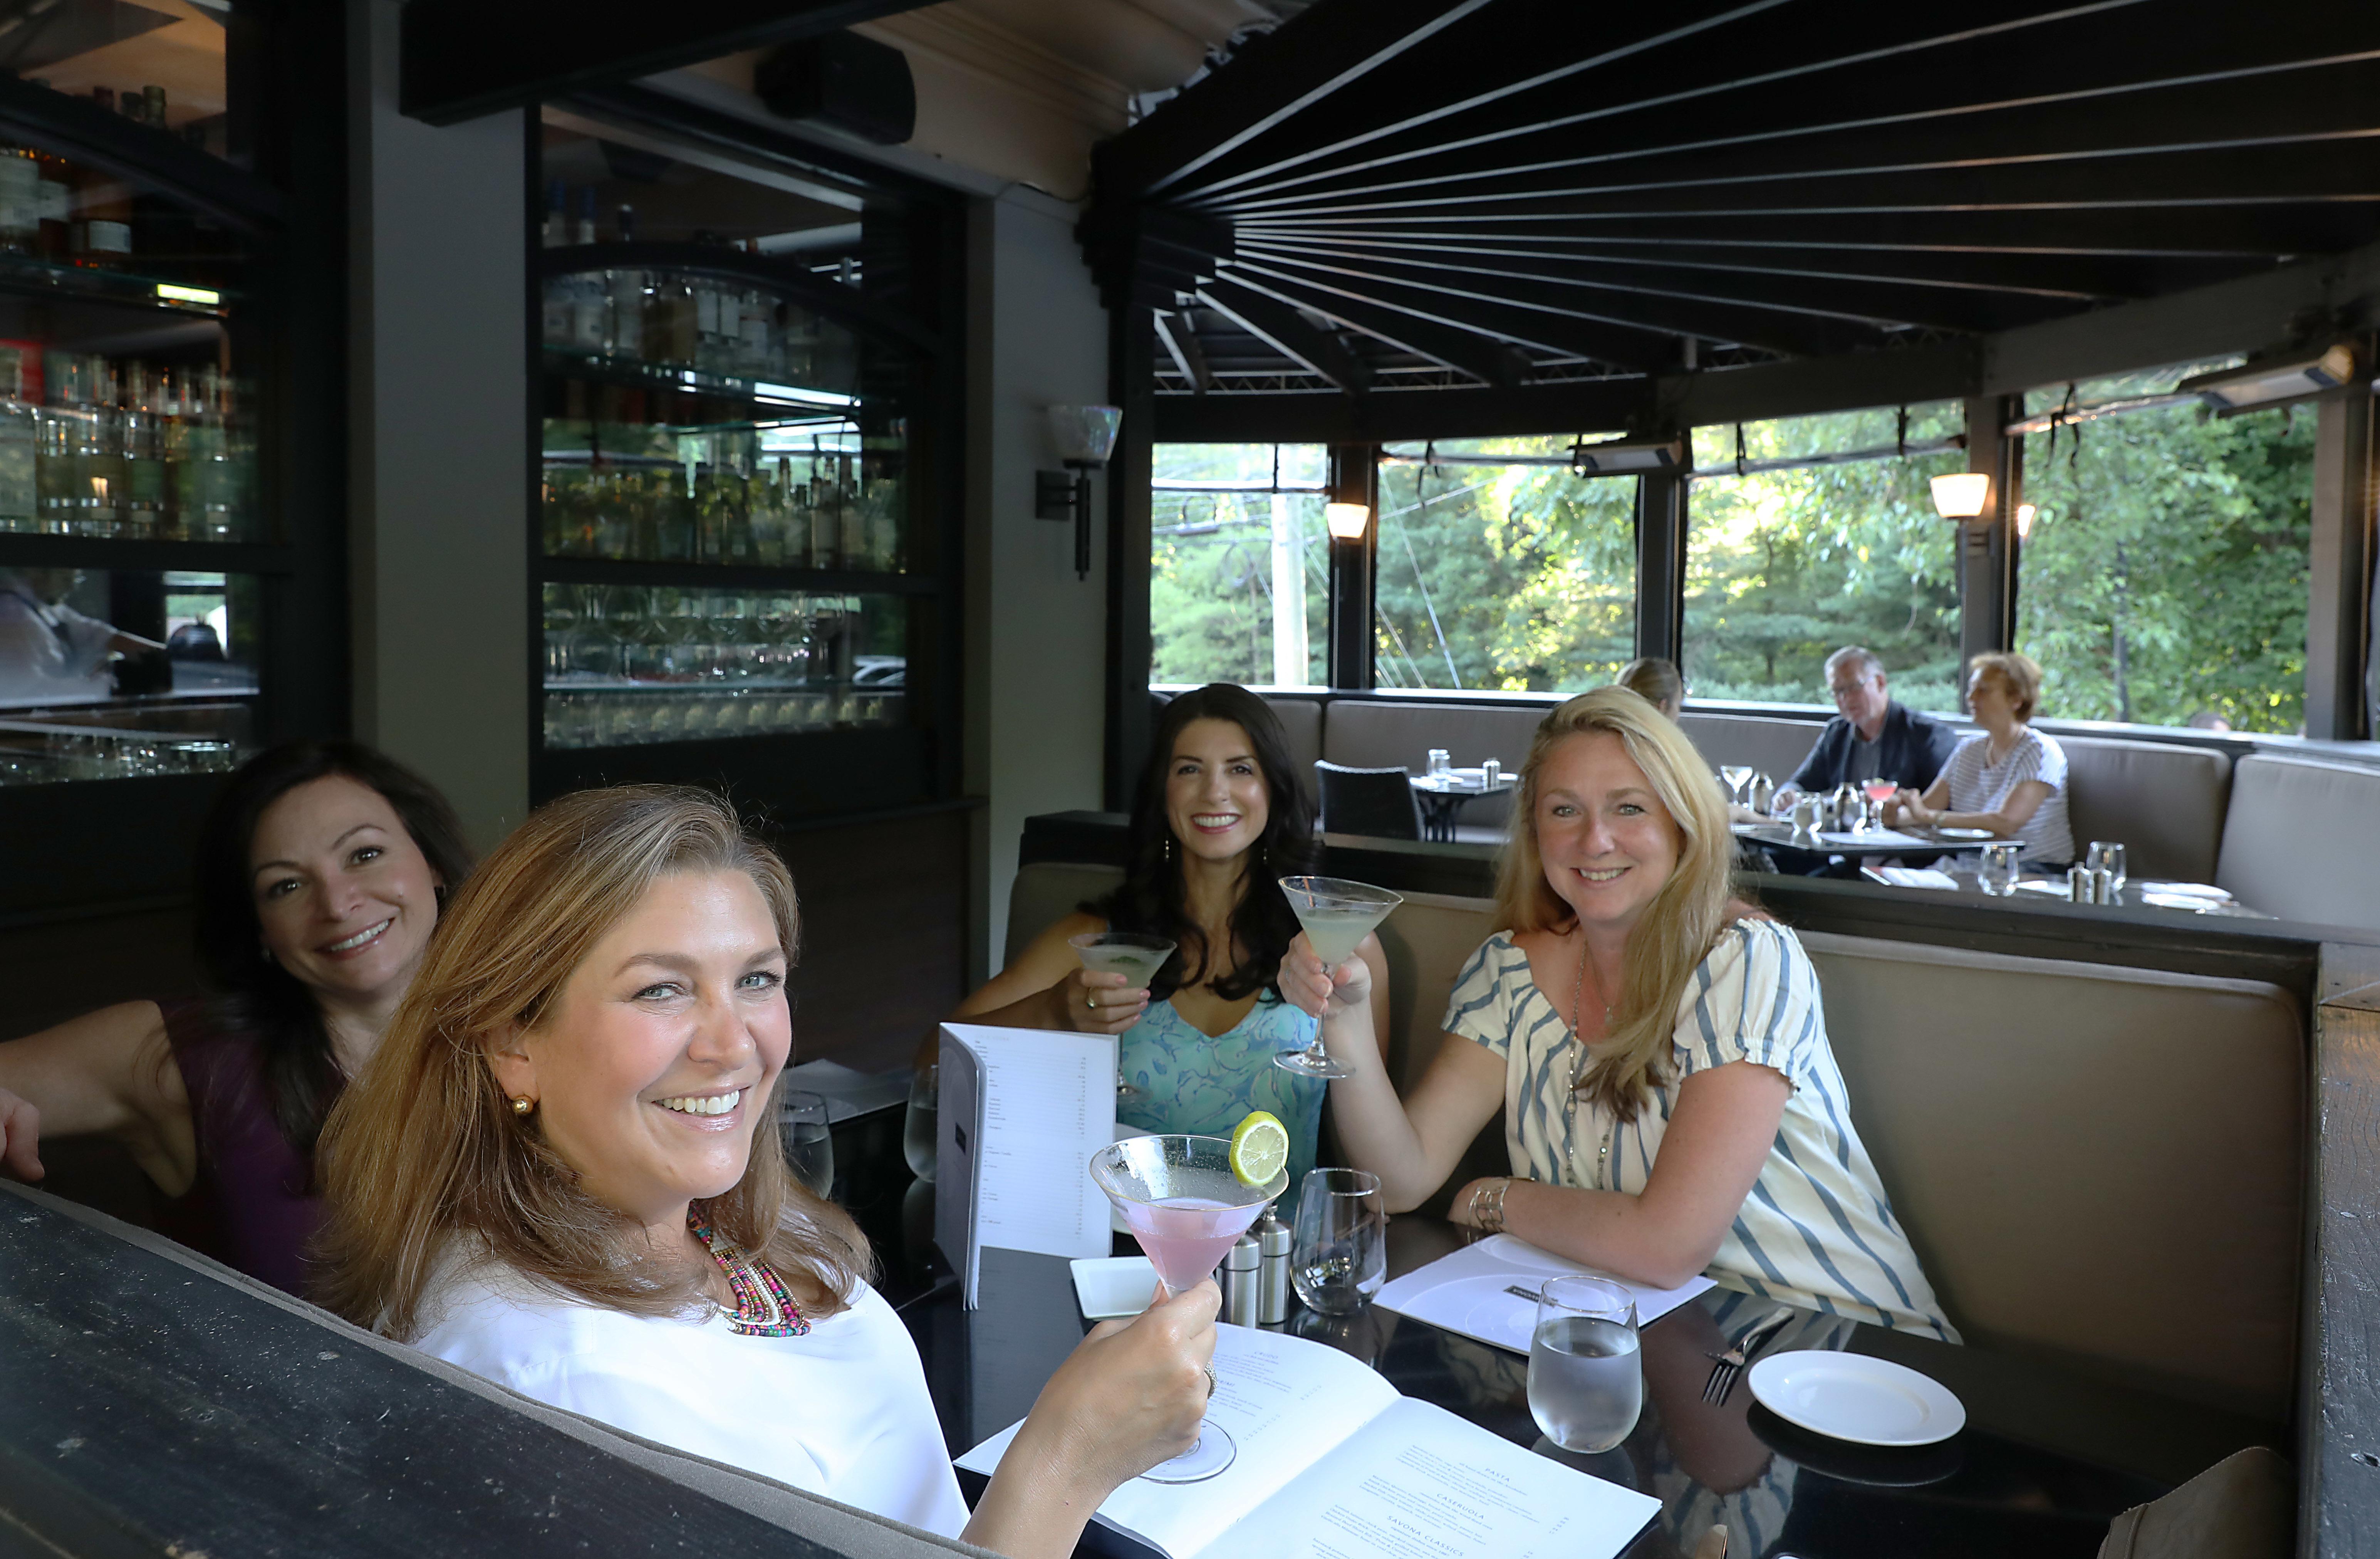 Customers, from left, Melanie Merlino, Lynne Shirna Briggs, Amanda Macielinski, Lynne Sundblad from Wayne, are having drinks at an outdoor table at Savona.